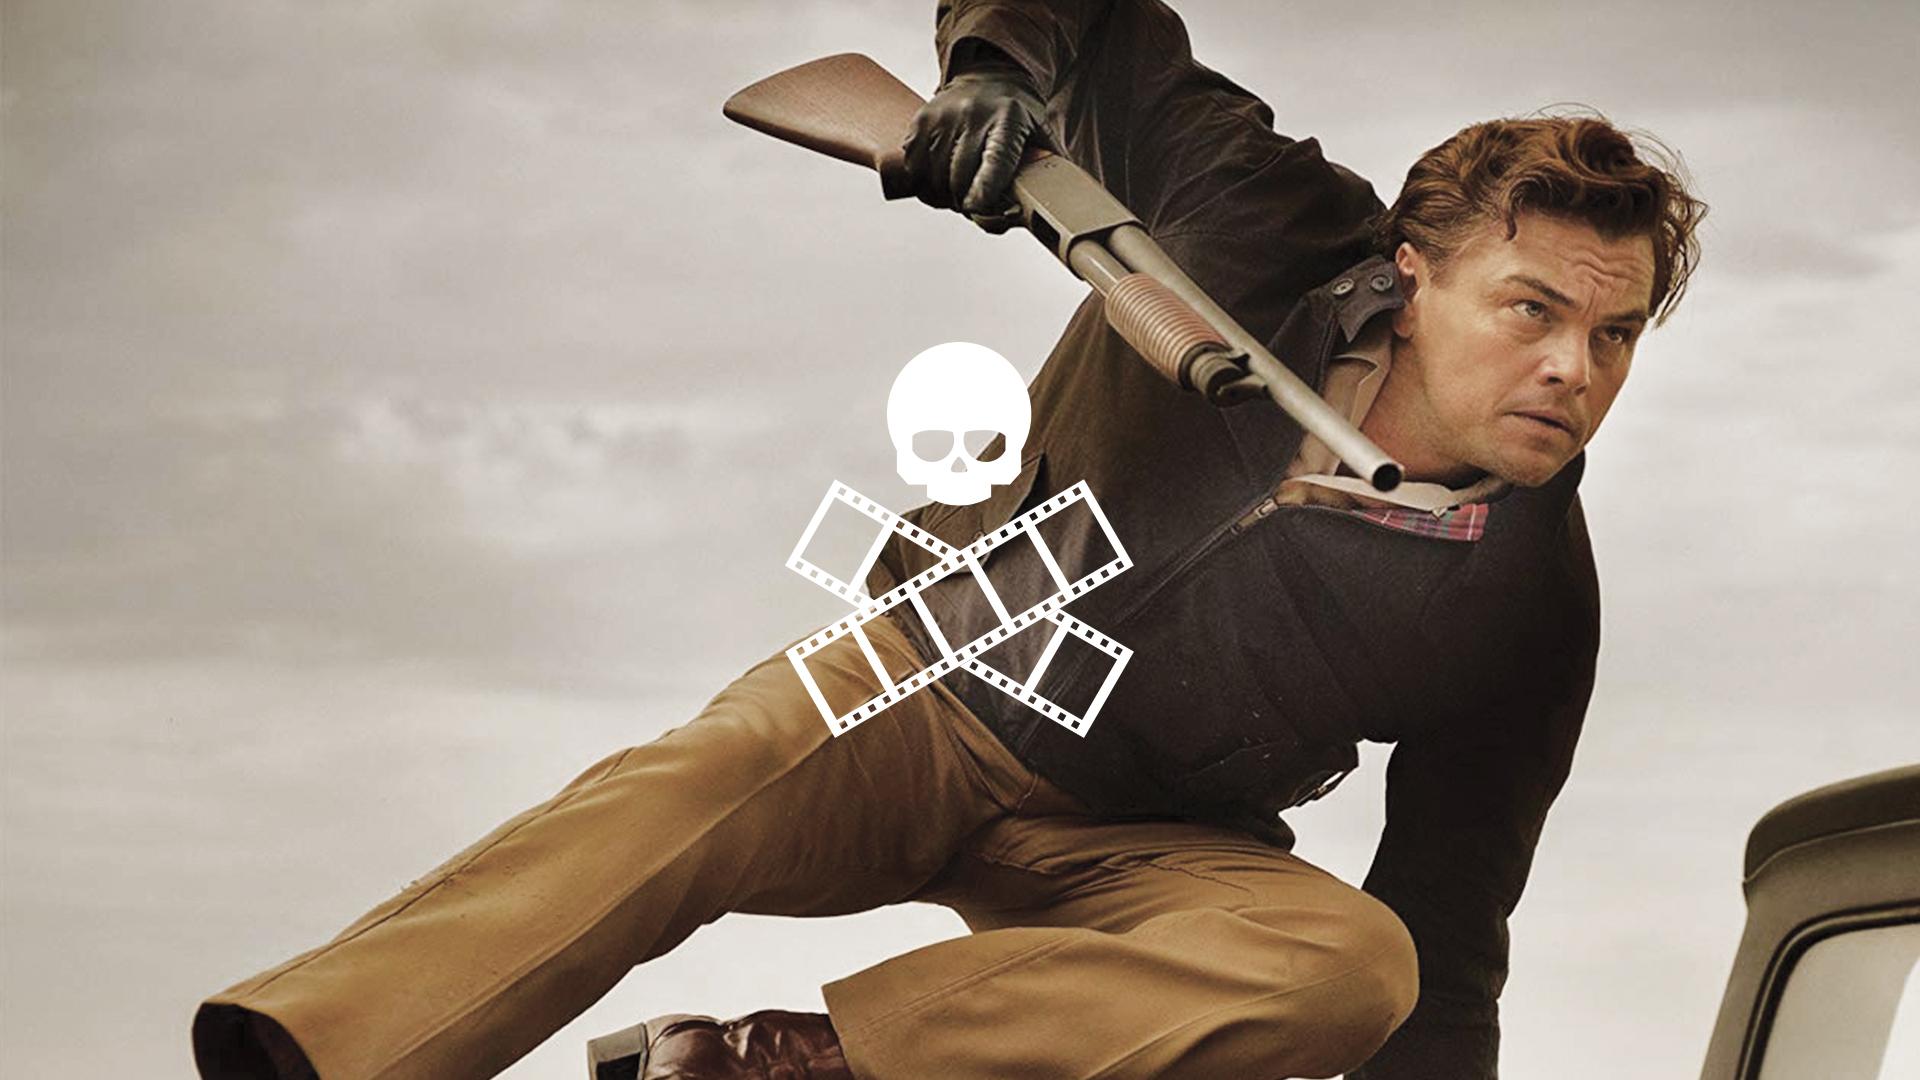 136. Save or Kill: 2019 Movies